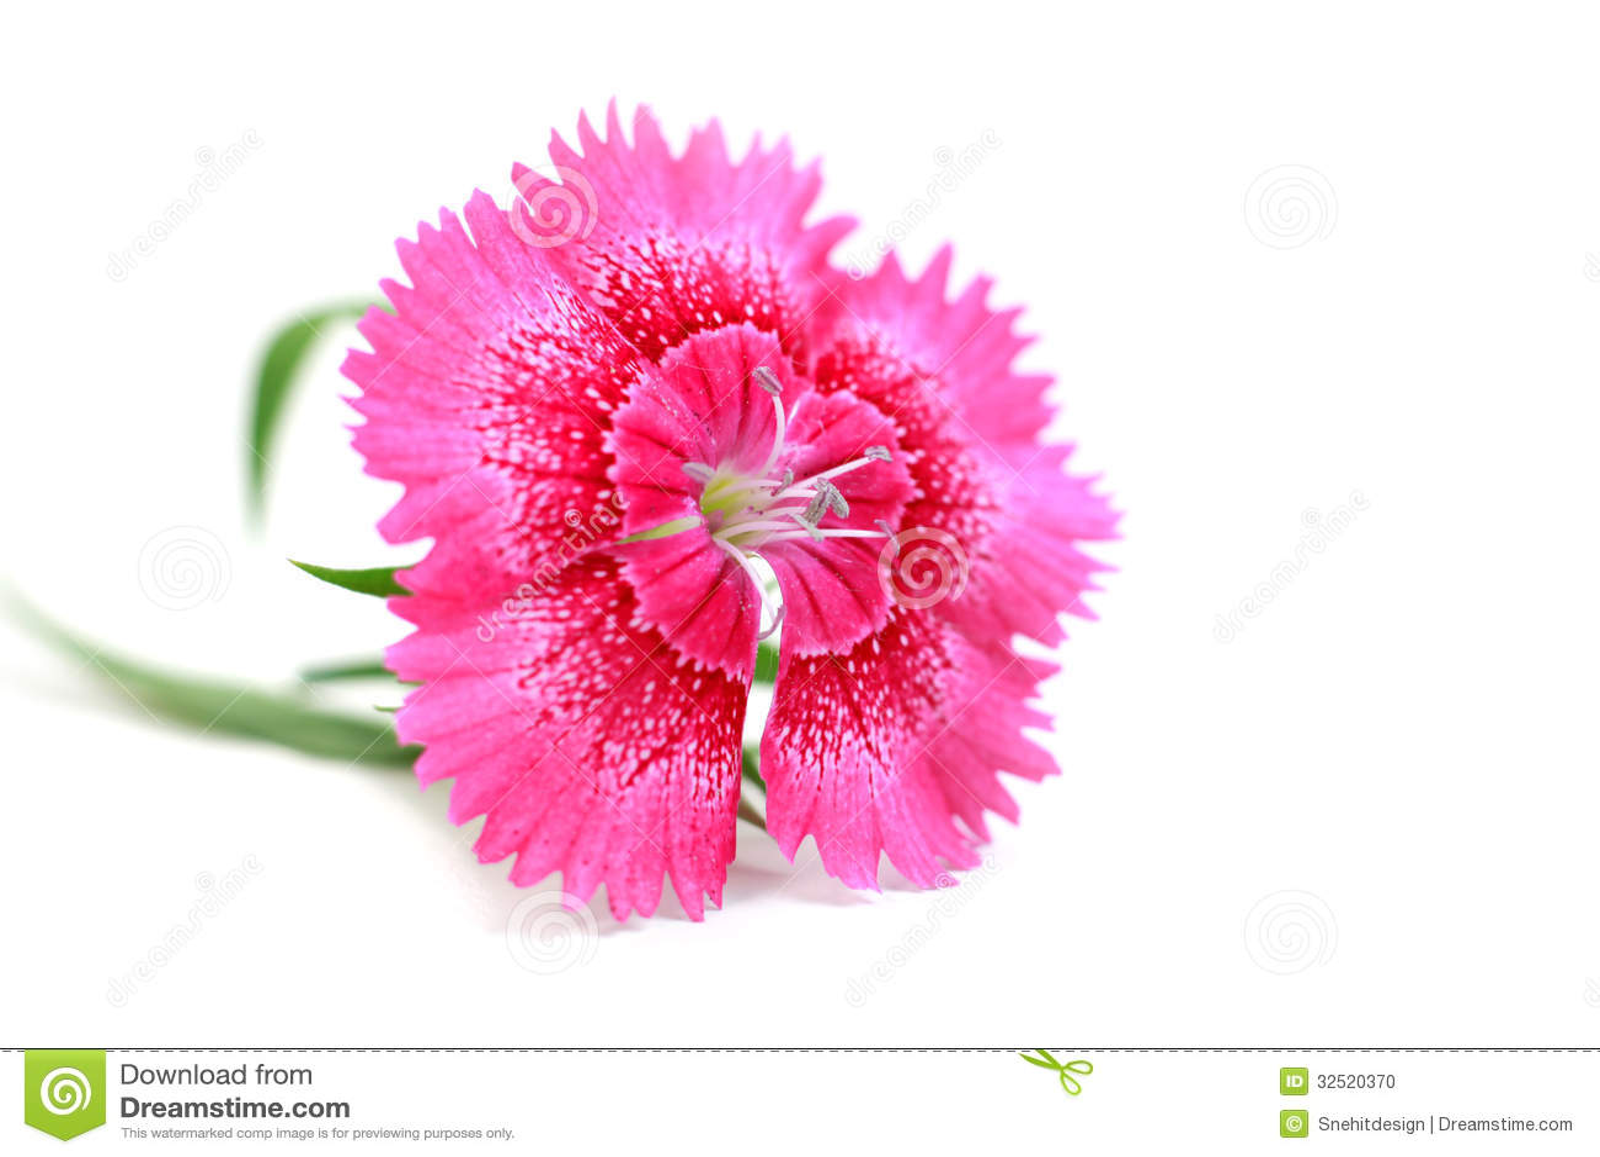 purple chrysanthemum flower